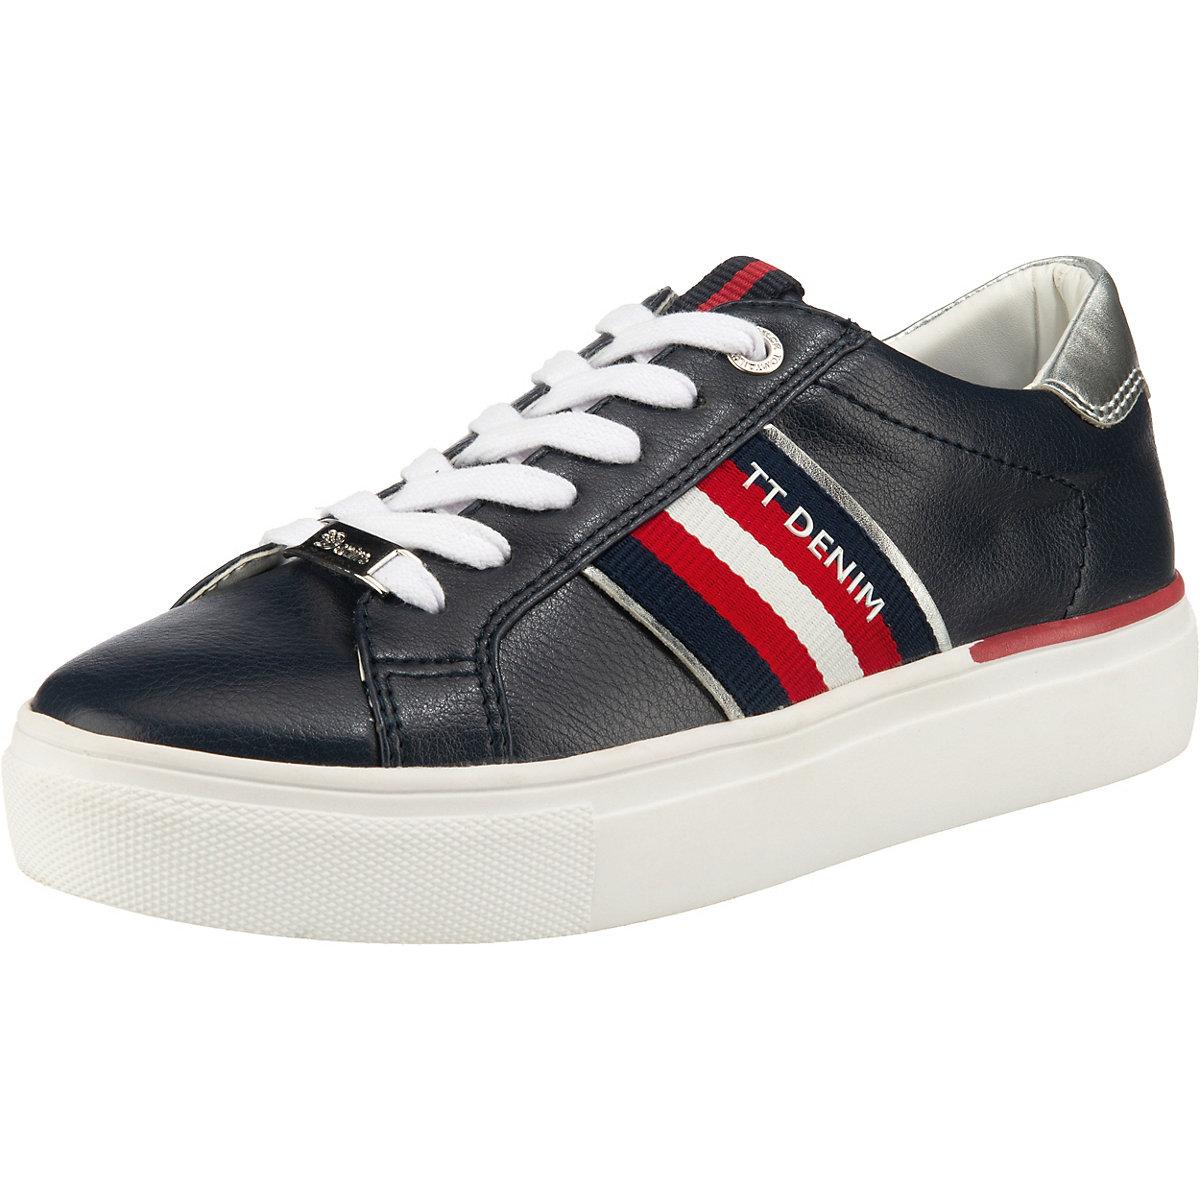 TOM TAILOR, Sneakers Low, dunkelblau